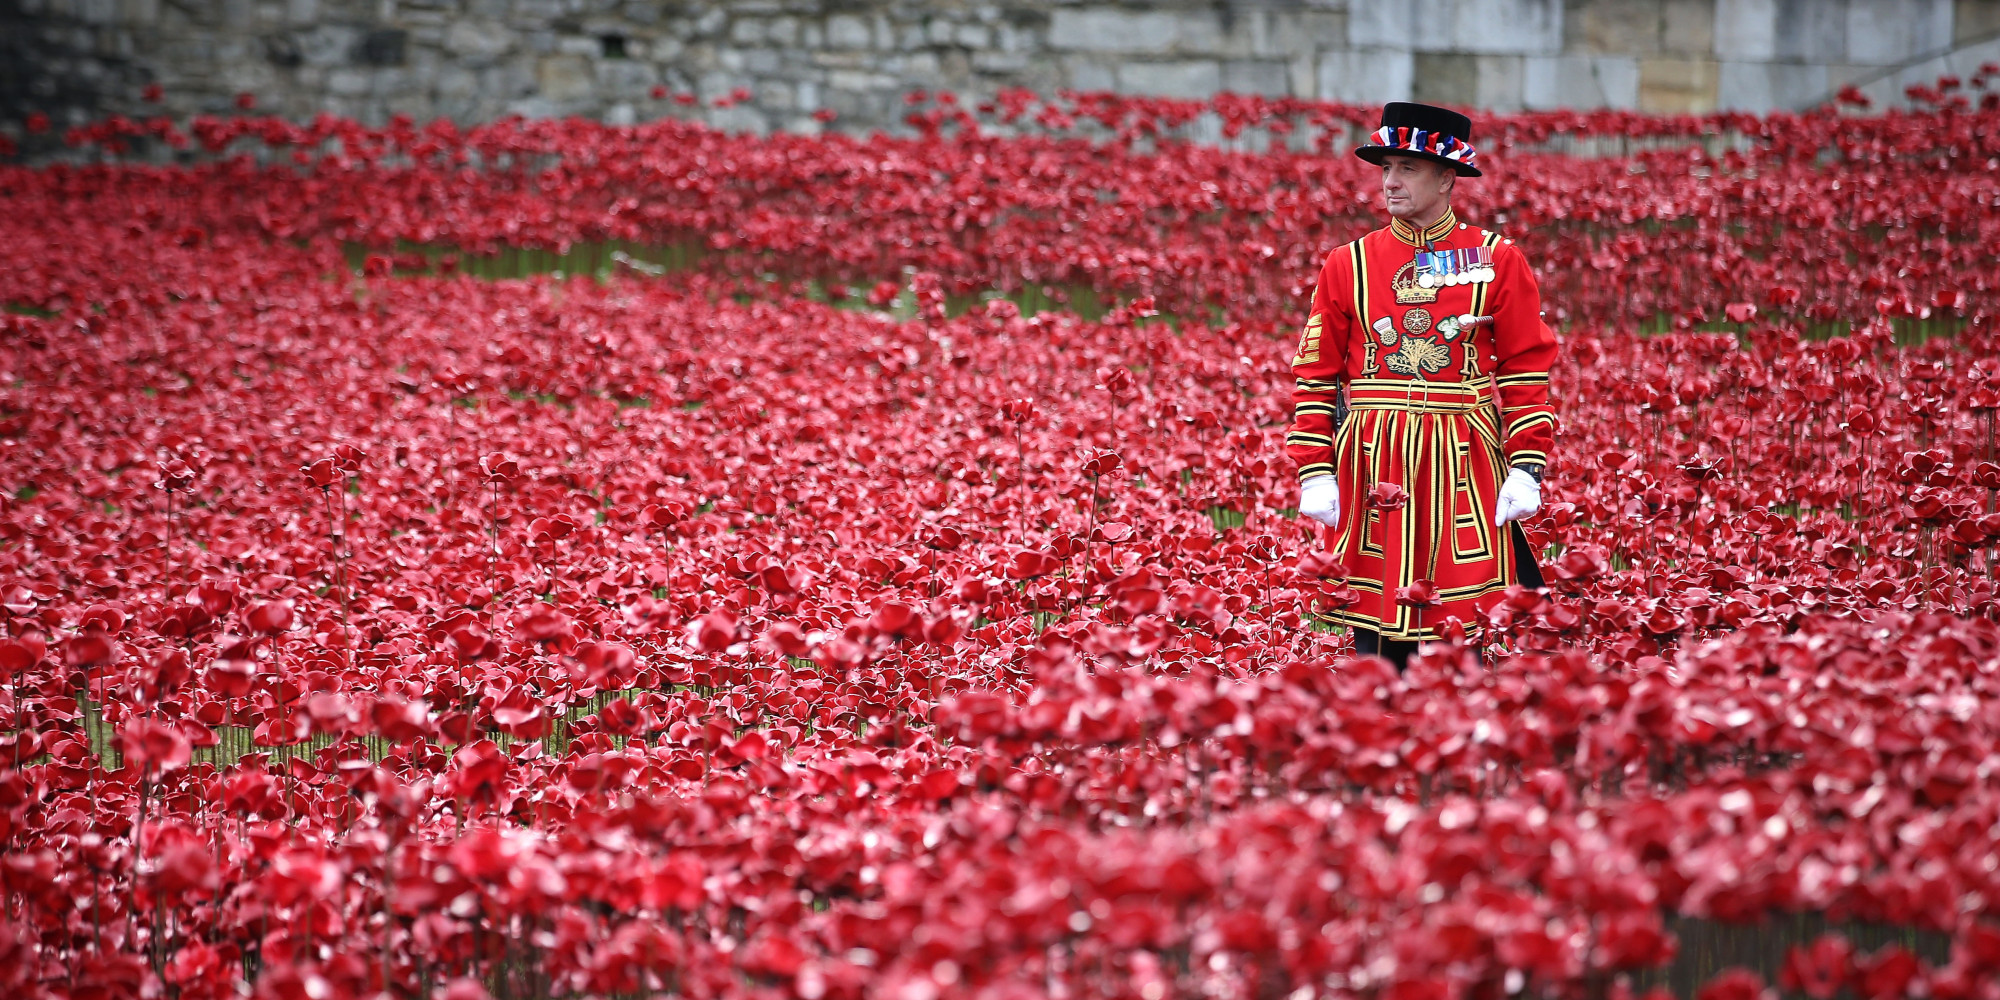 europe marks armistice day with solemn ceremonies  photos